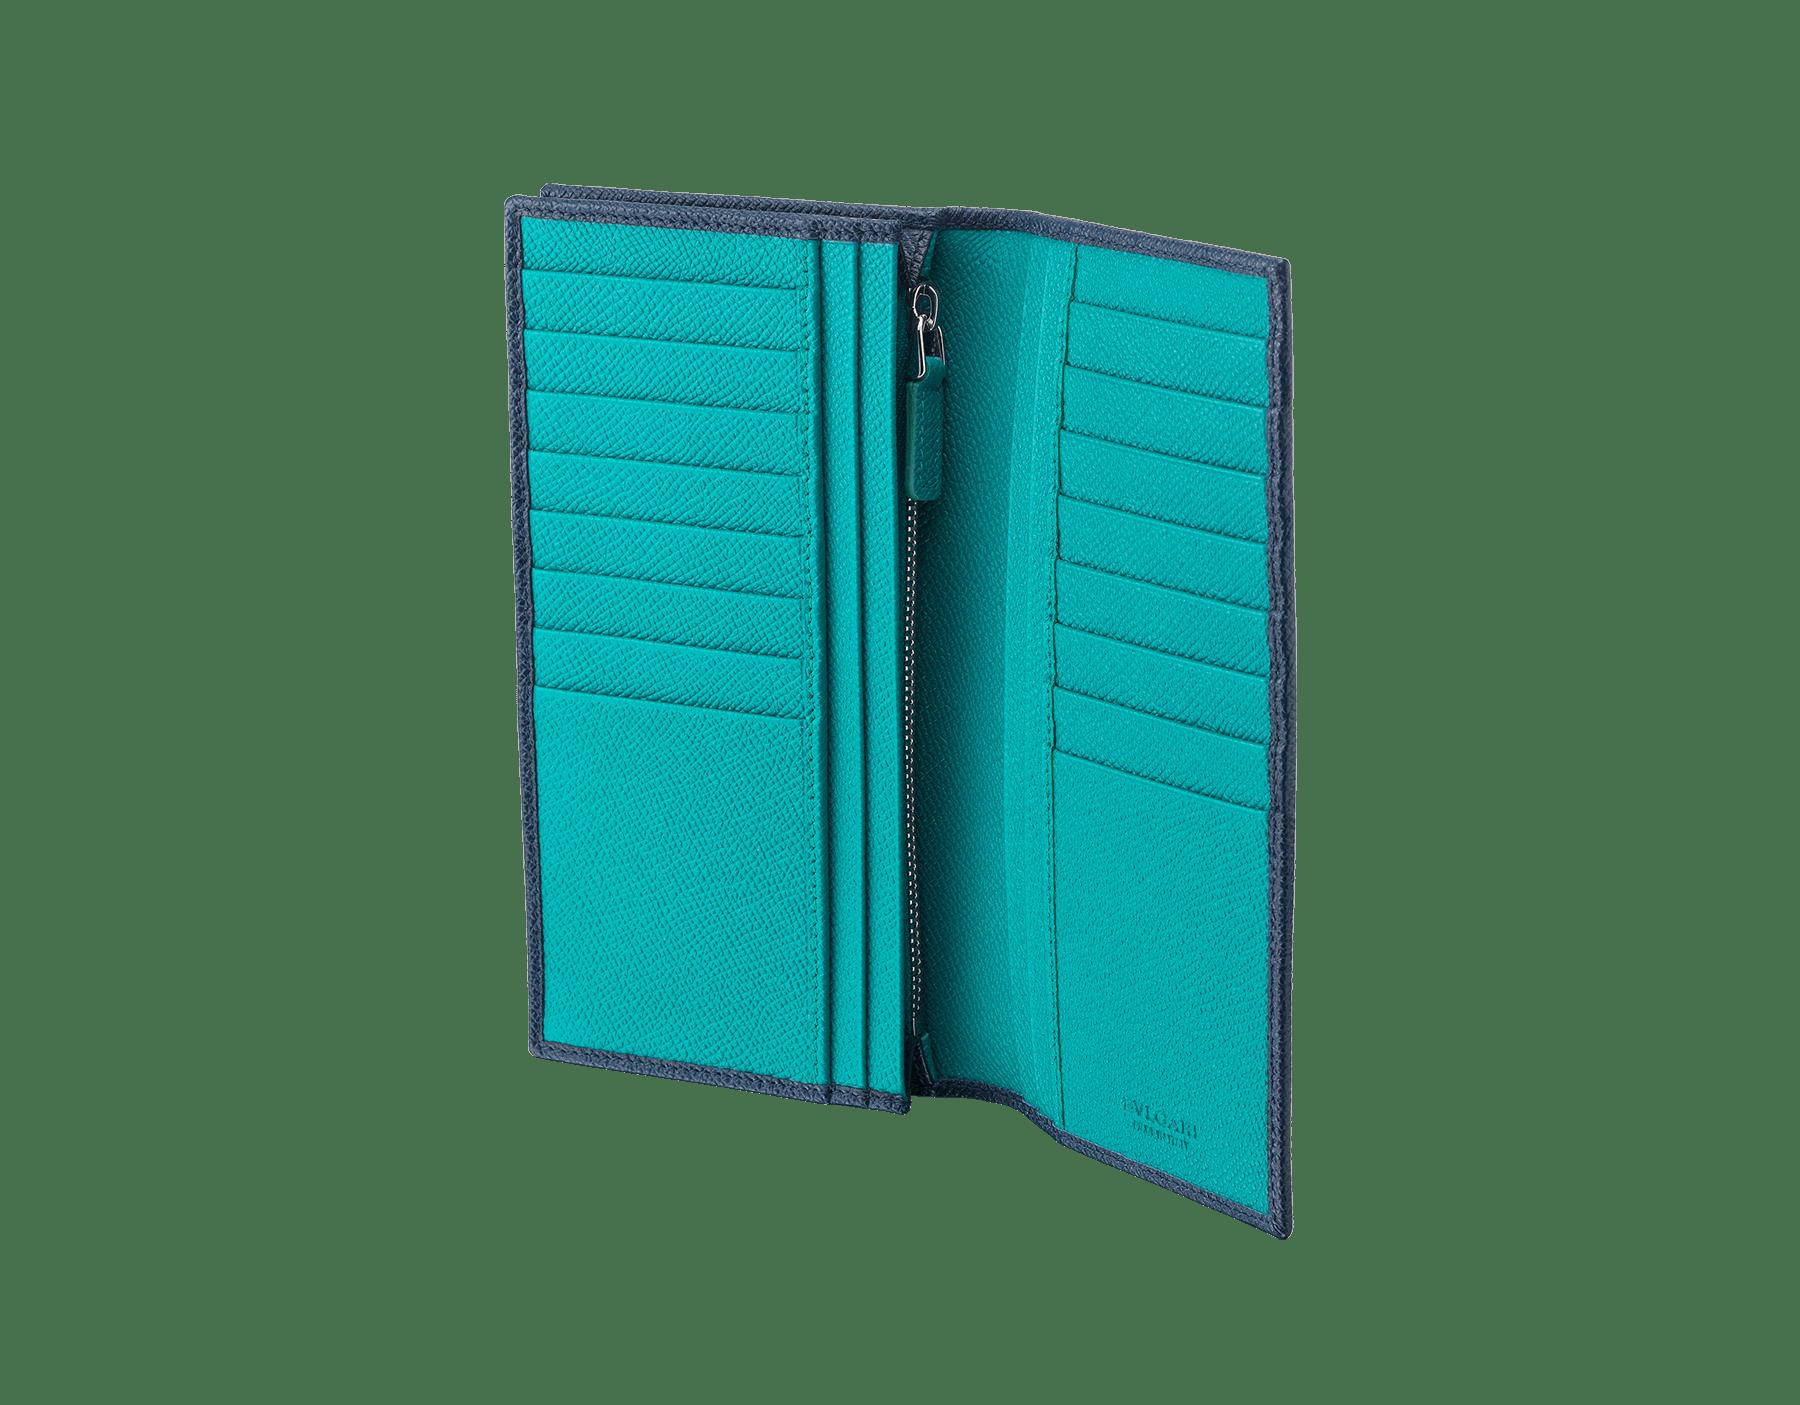 BVLGARI BVLGARI 男用日圓皮夾採用丹寧藍和熱帶綠松石色珠面小牛皮。經典品牌標誌鍍鈀黃銅元素。 288259 image 2